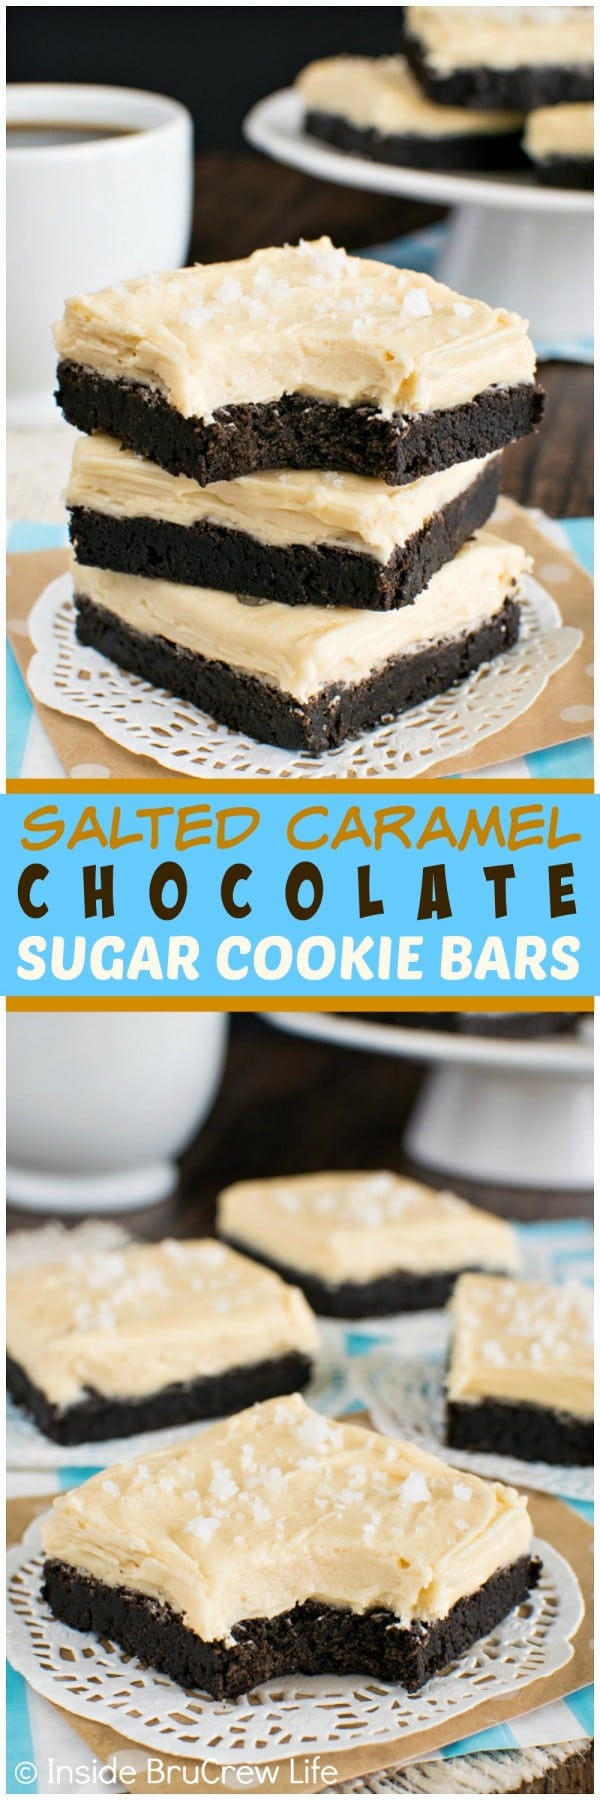 Salted Caramel Chocolate Sugar Cookie Bars